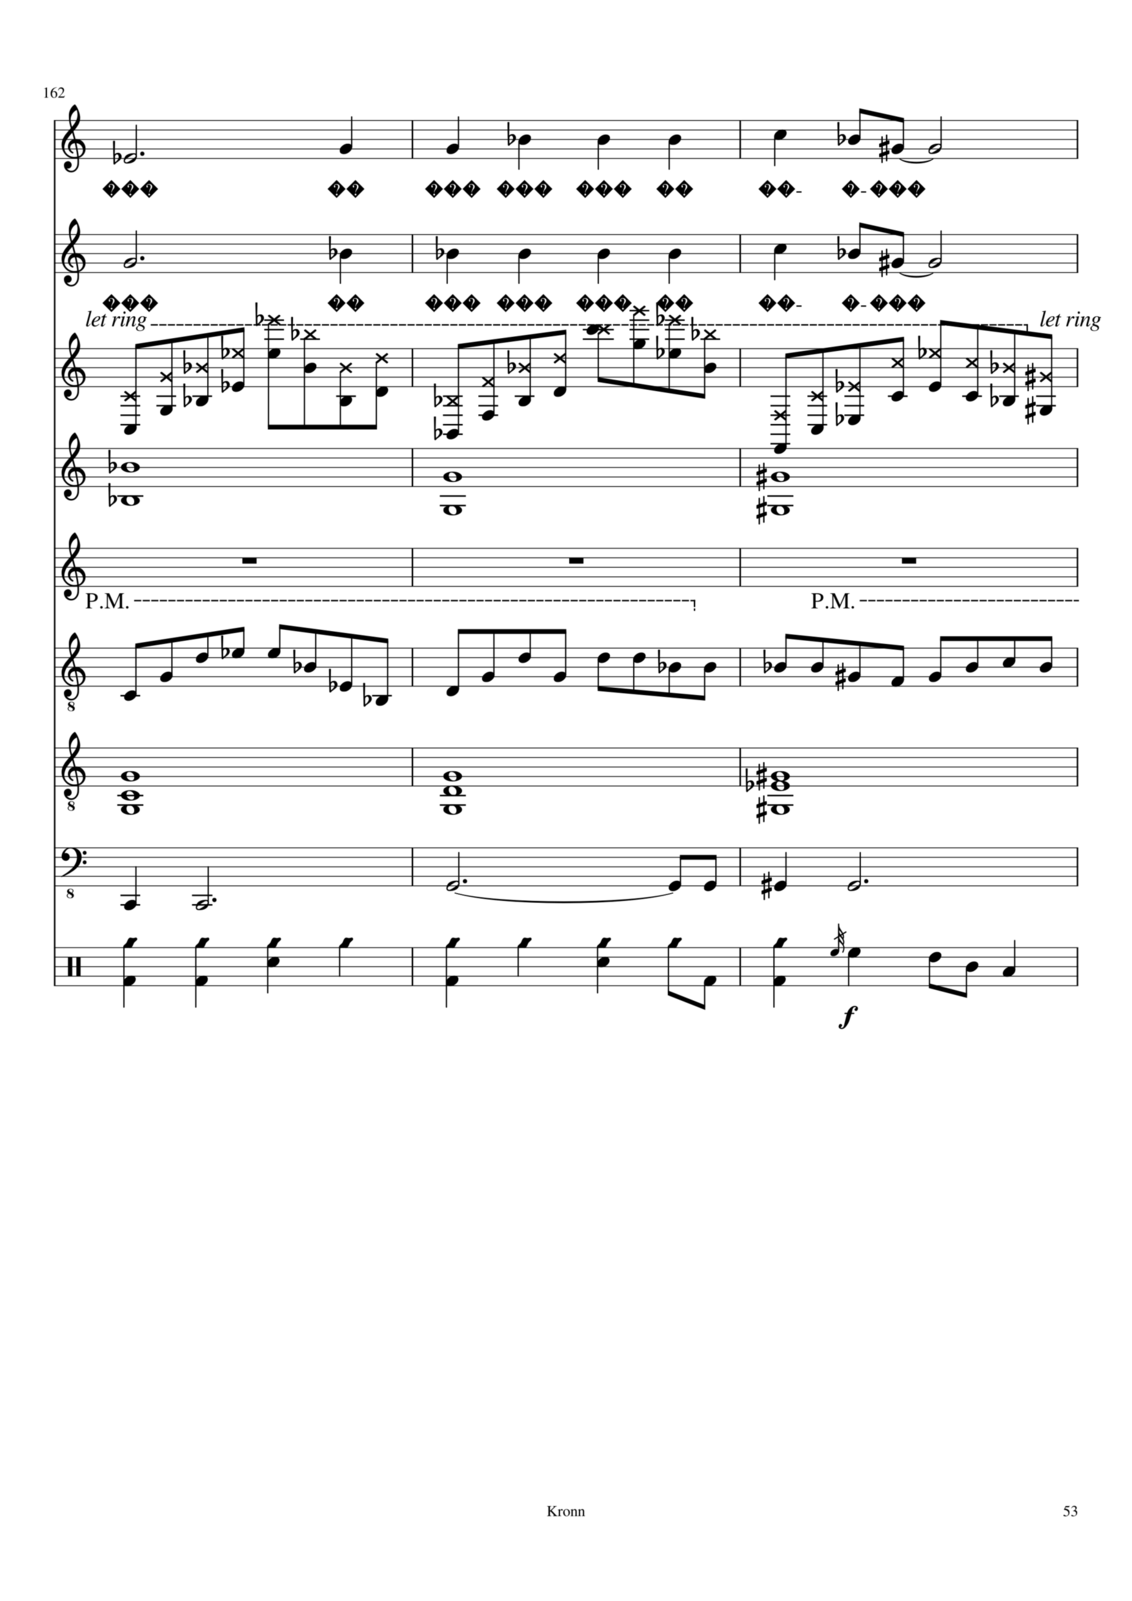 Okean Pustotyi slide, Image 53